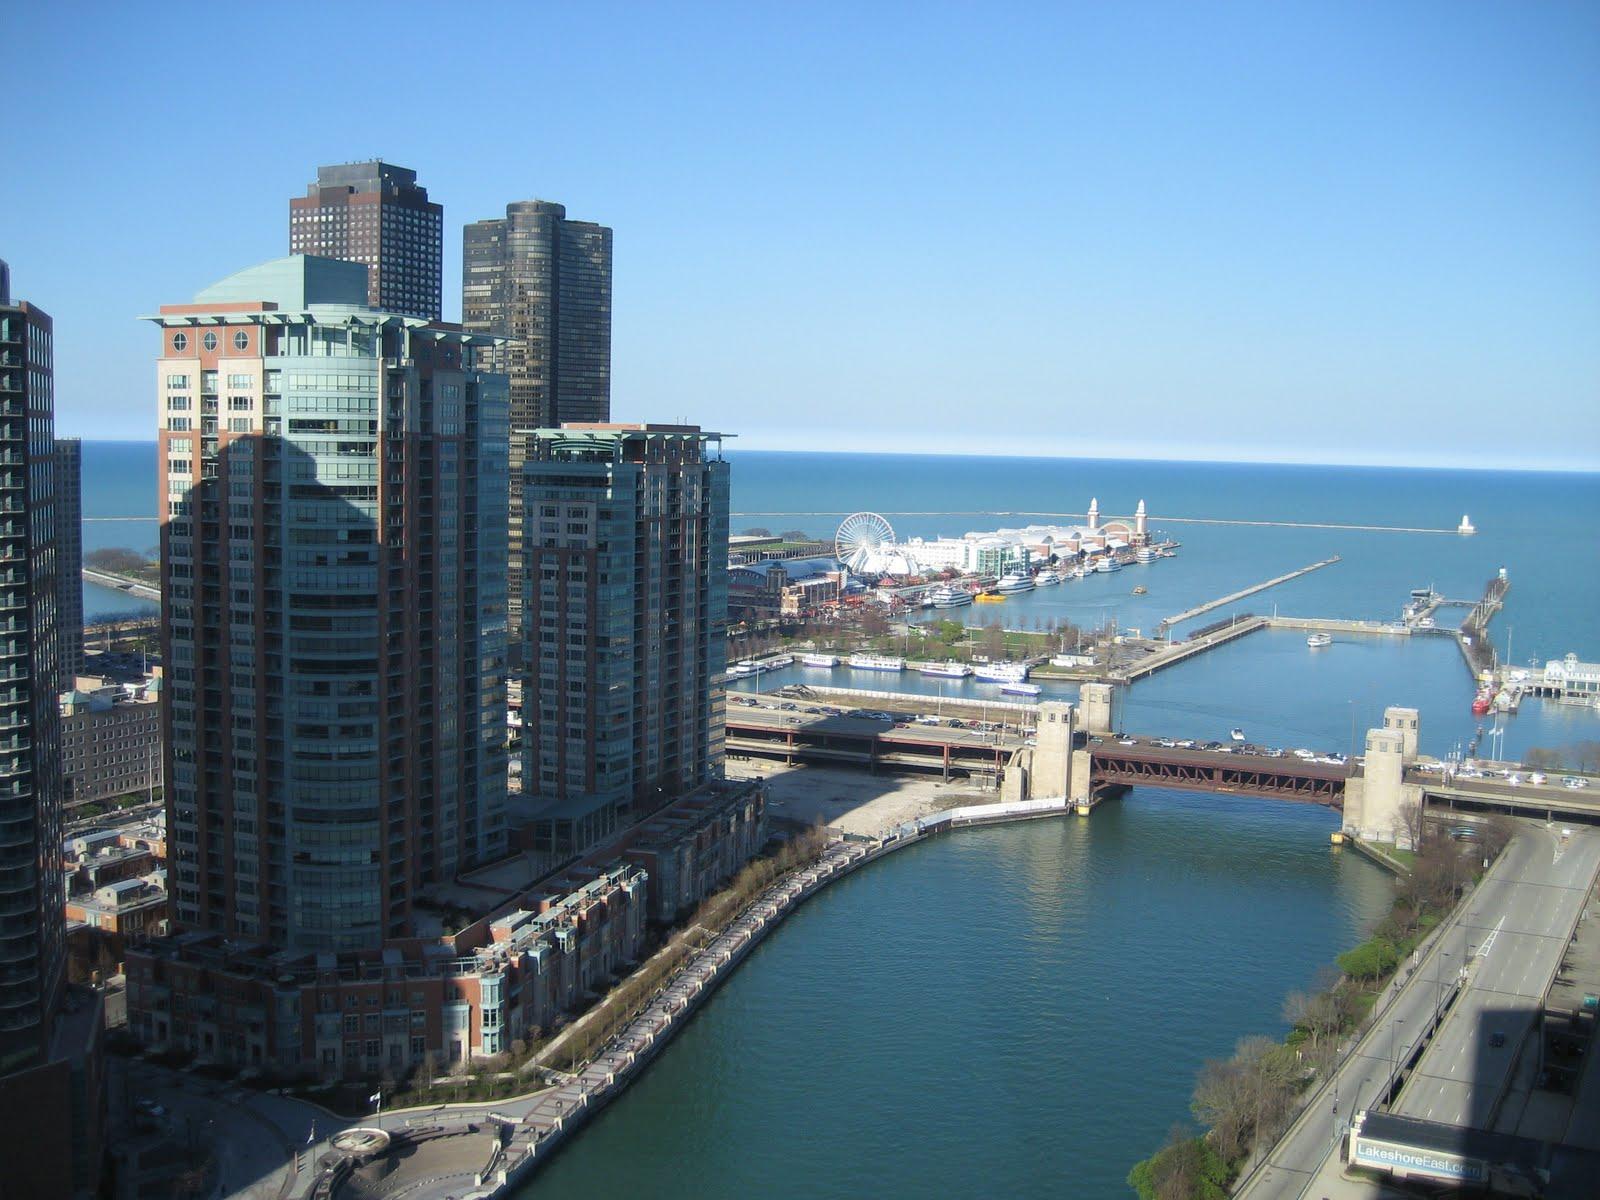 Swissotel Chicago No Comments 4 12